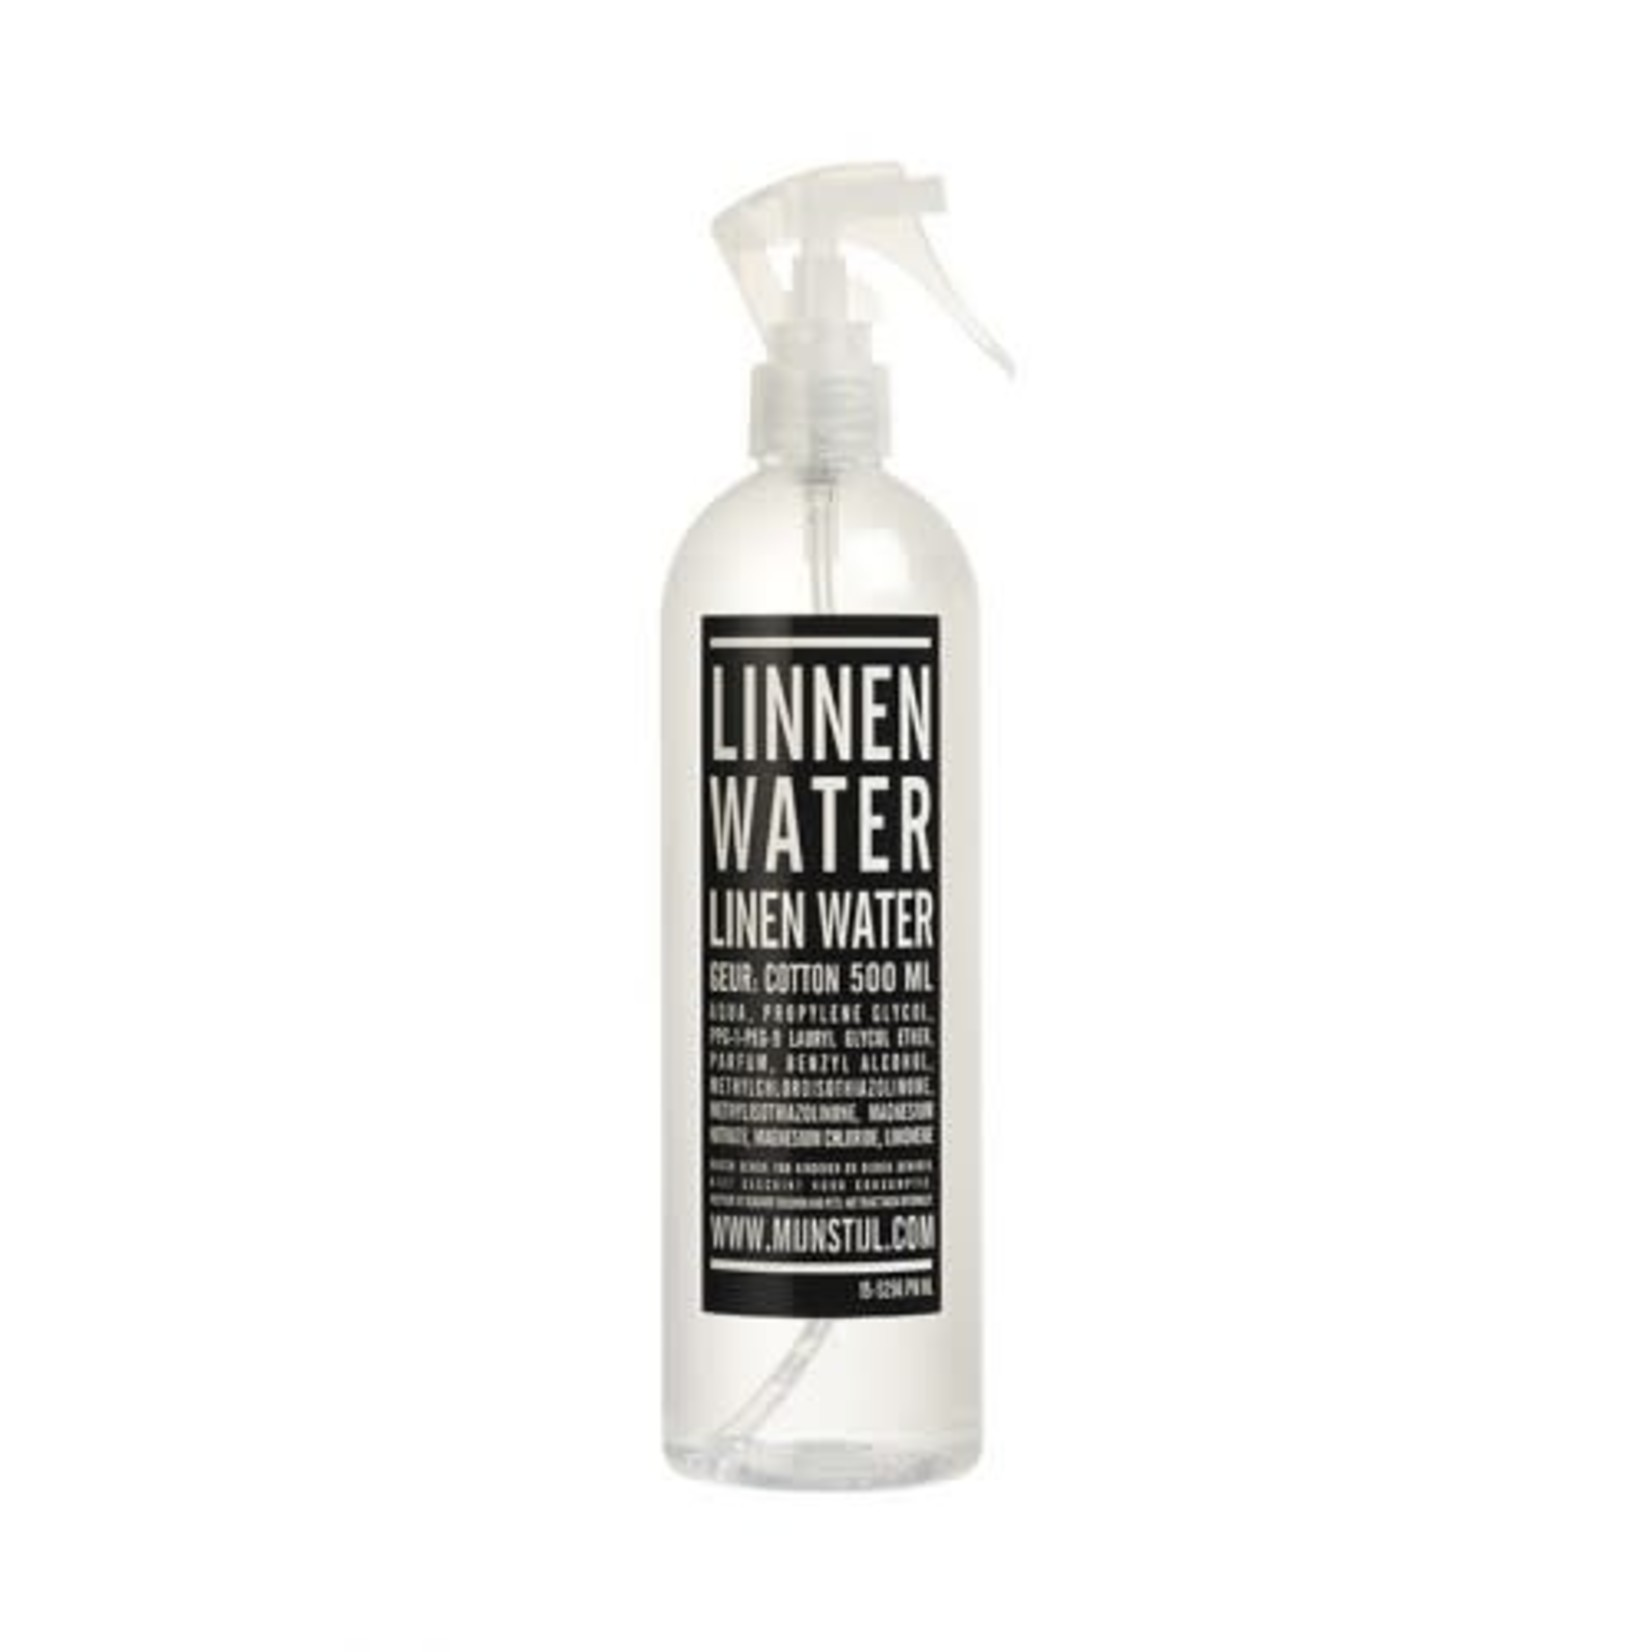 Mijn Stijl Linnenwater Cotton 500ml